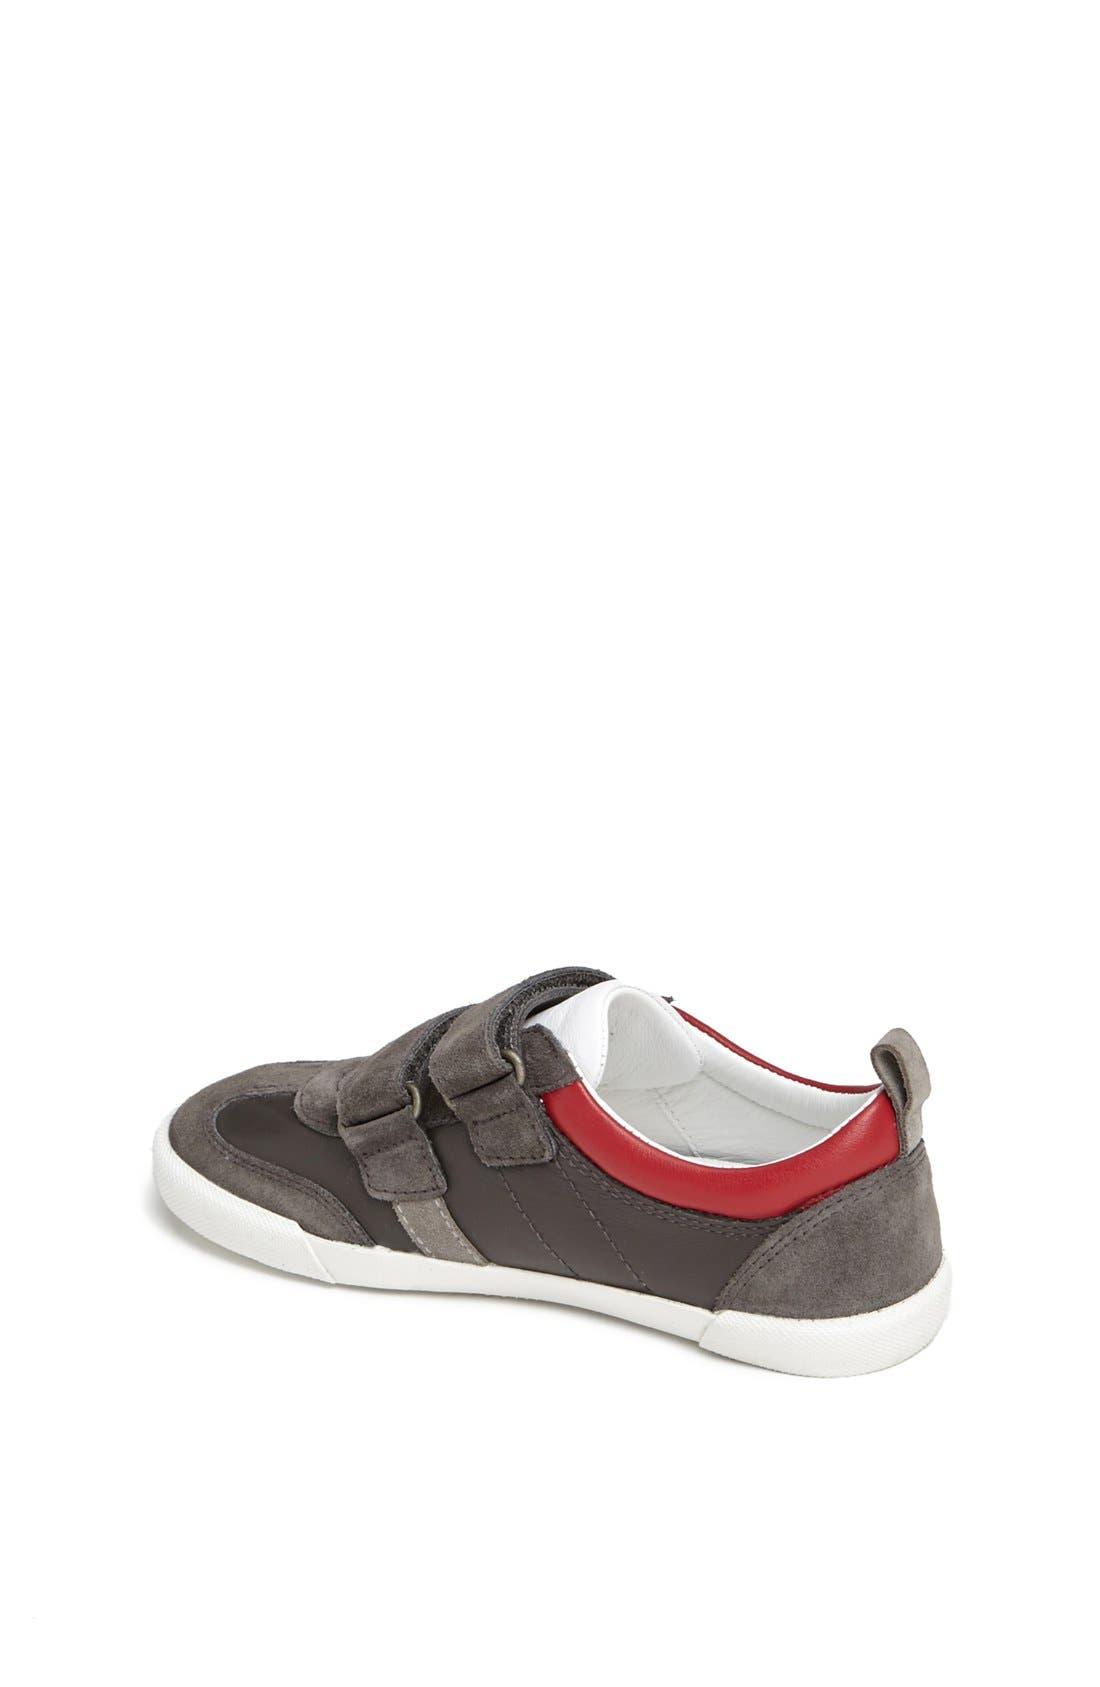 Alternate Image 2  - Dolce&Gabbana Sneaker (Toddler, Little Kid & Big Kid)